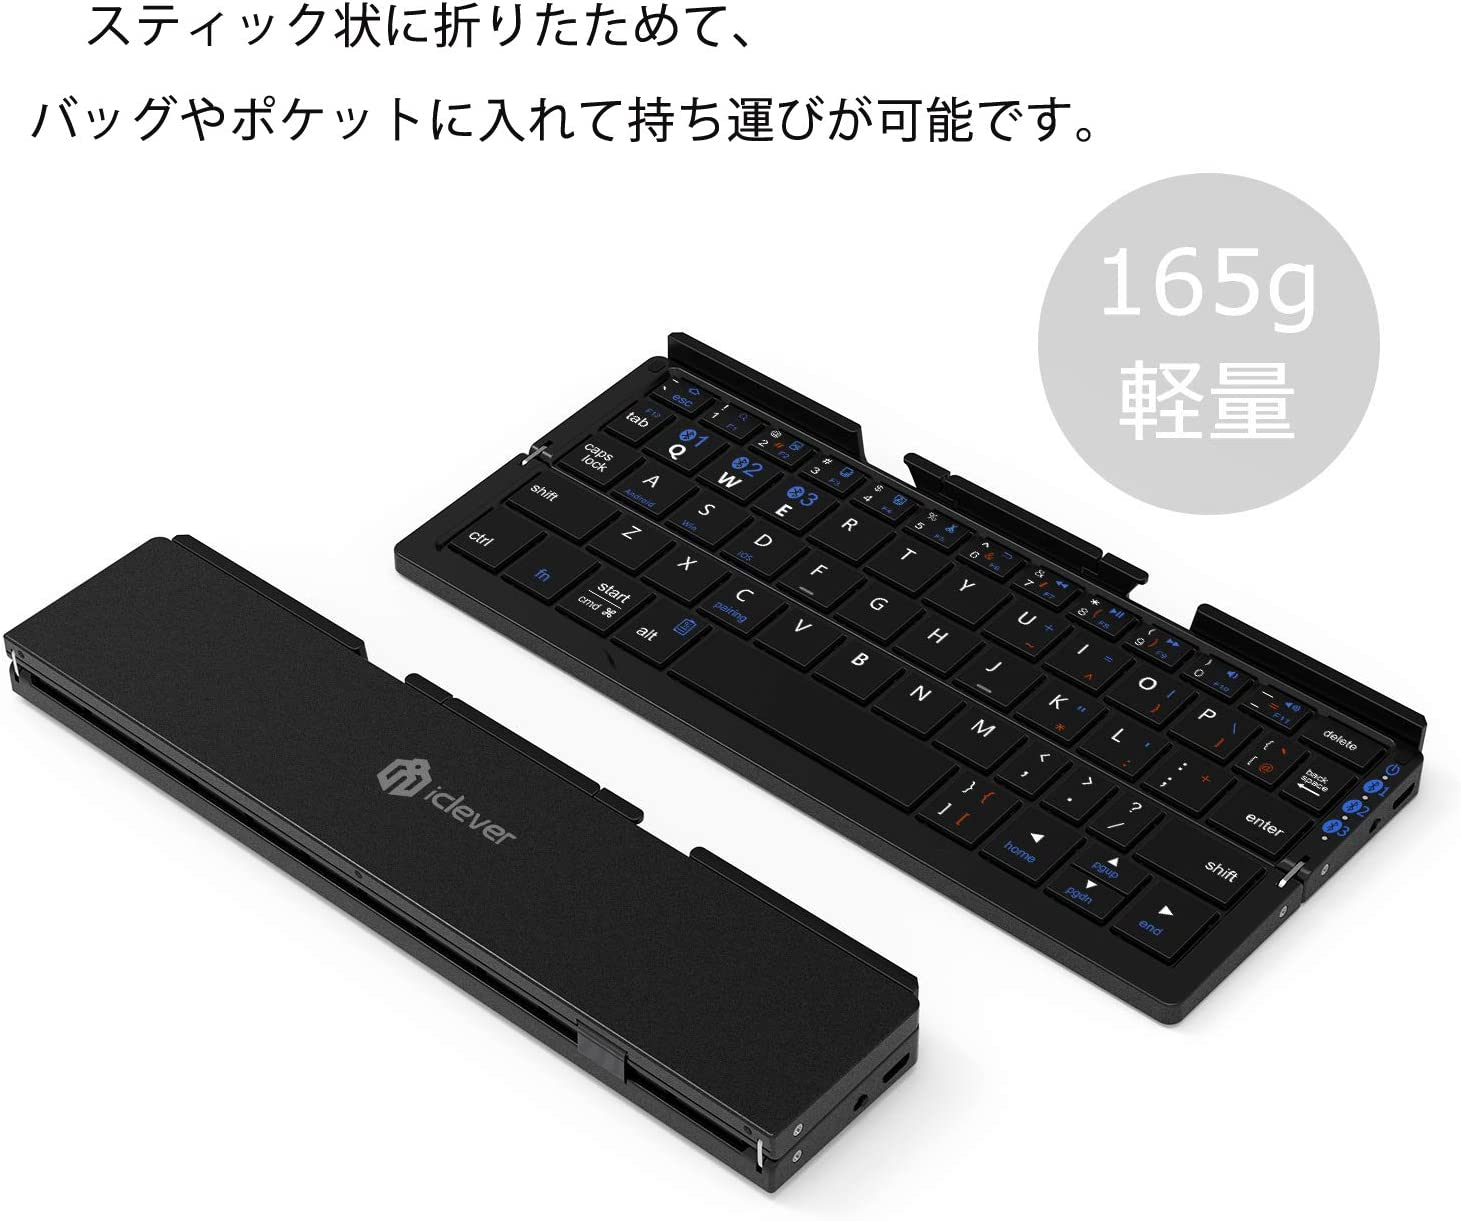 Bluetooth キーボード iclever